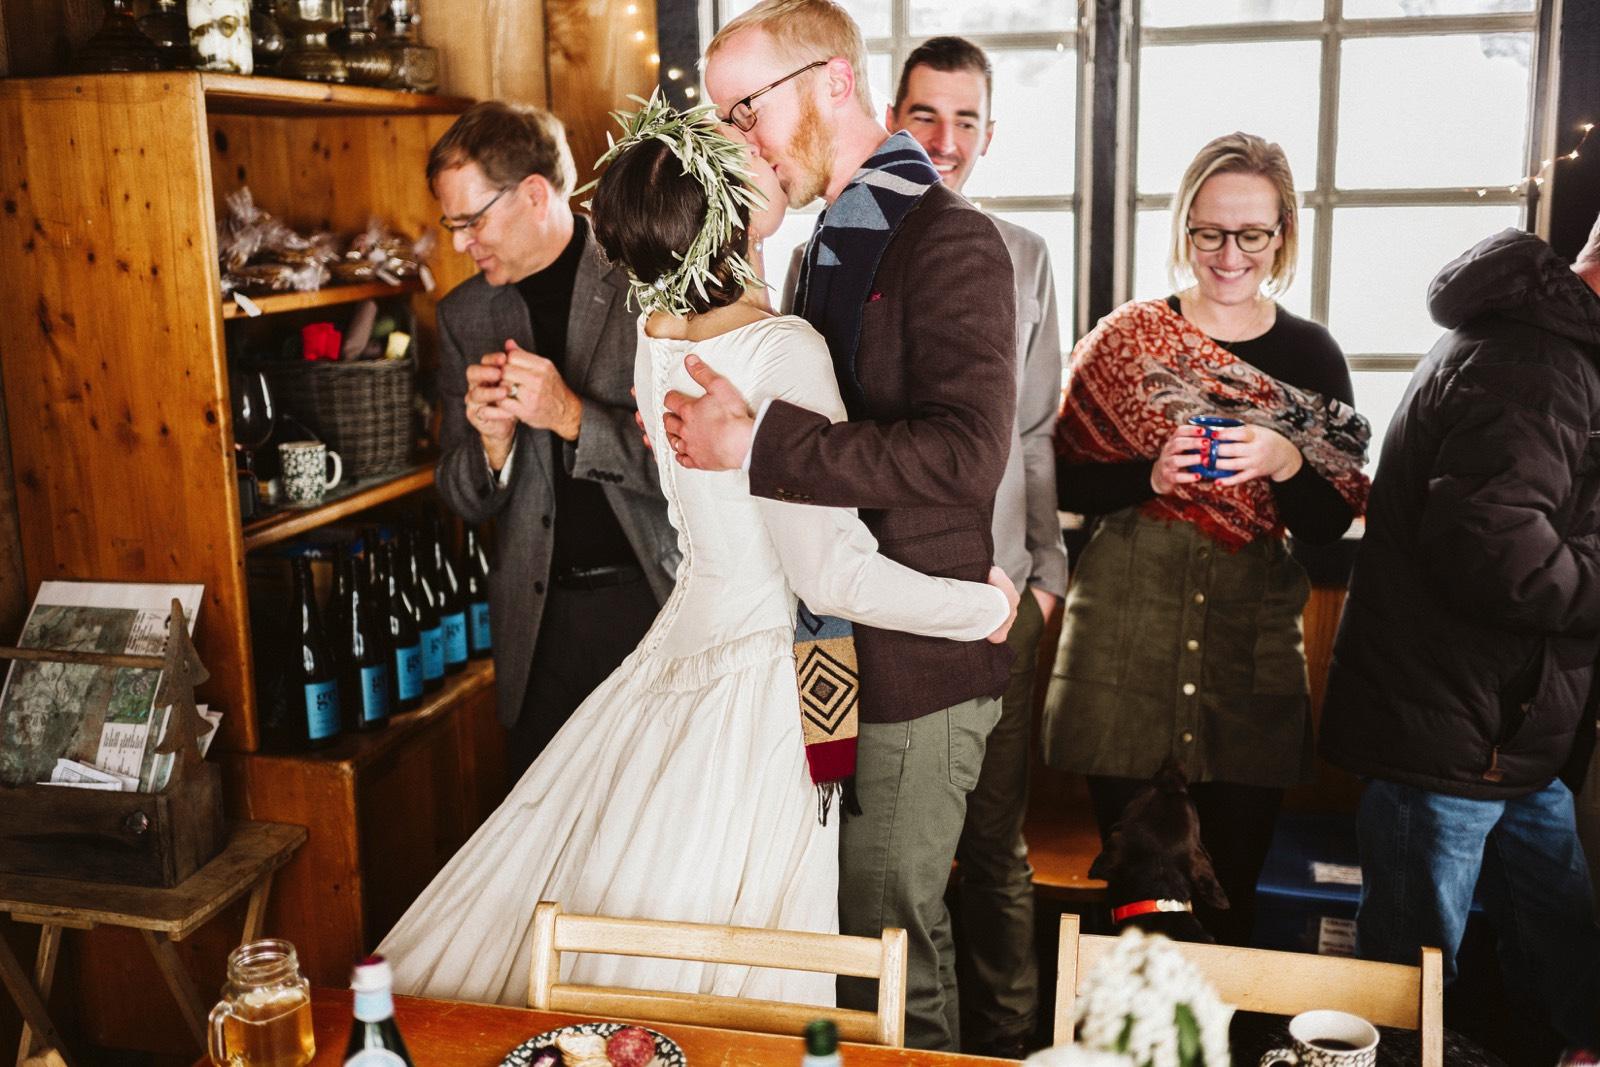 alpine-lakes-high-camp-winter-wedding-71 ALPINE LAKES HIGH CAMP WEDDING